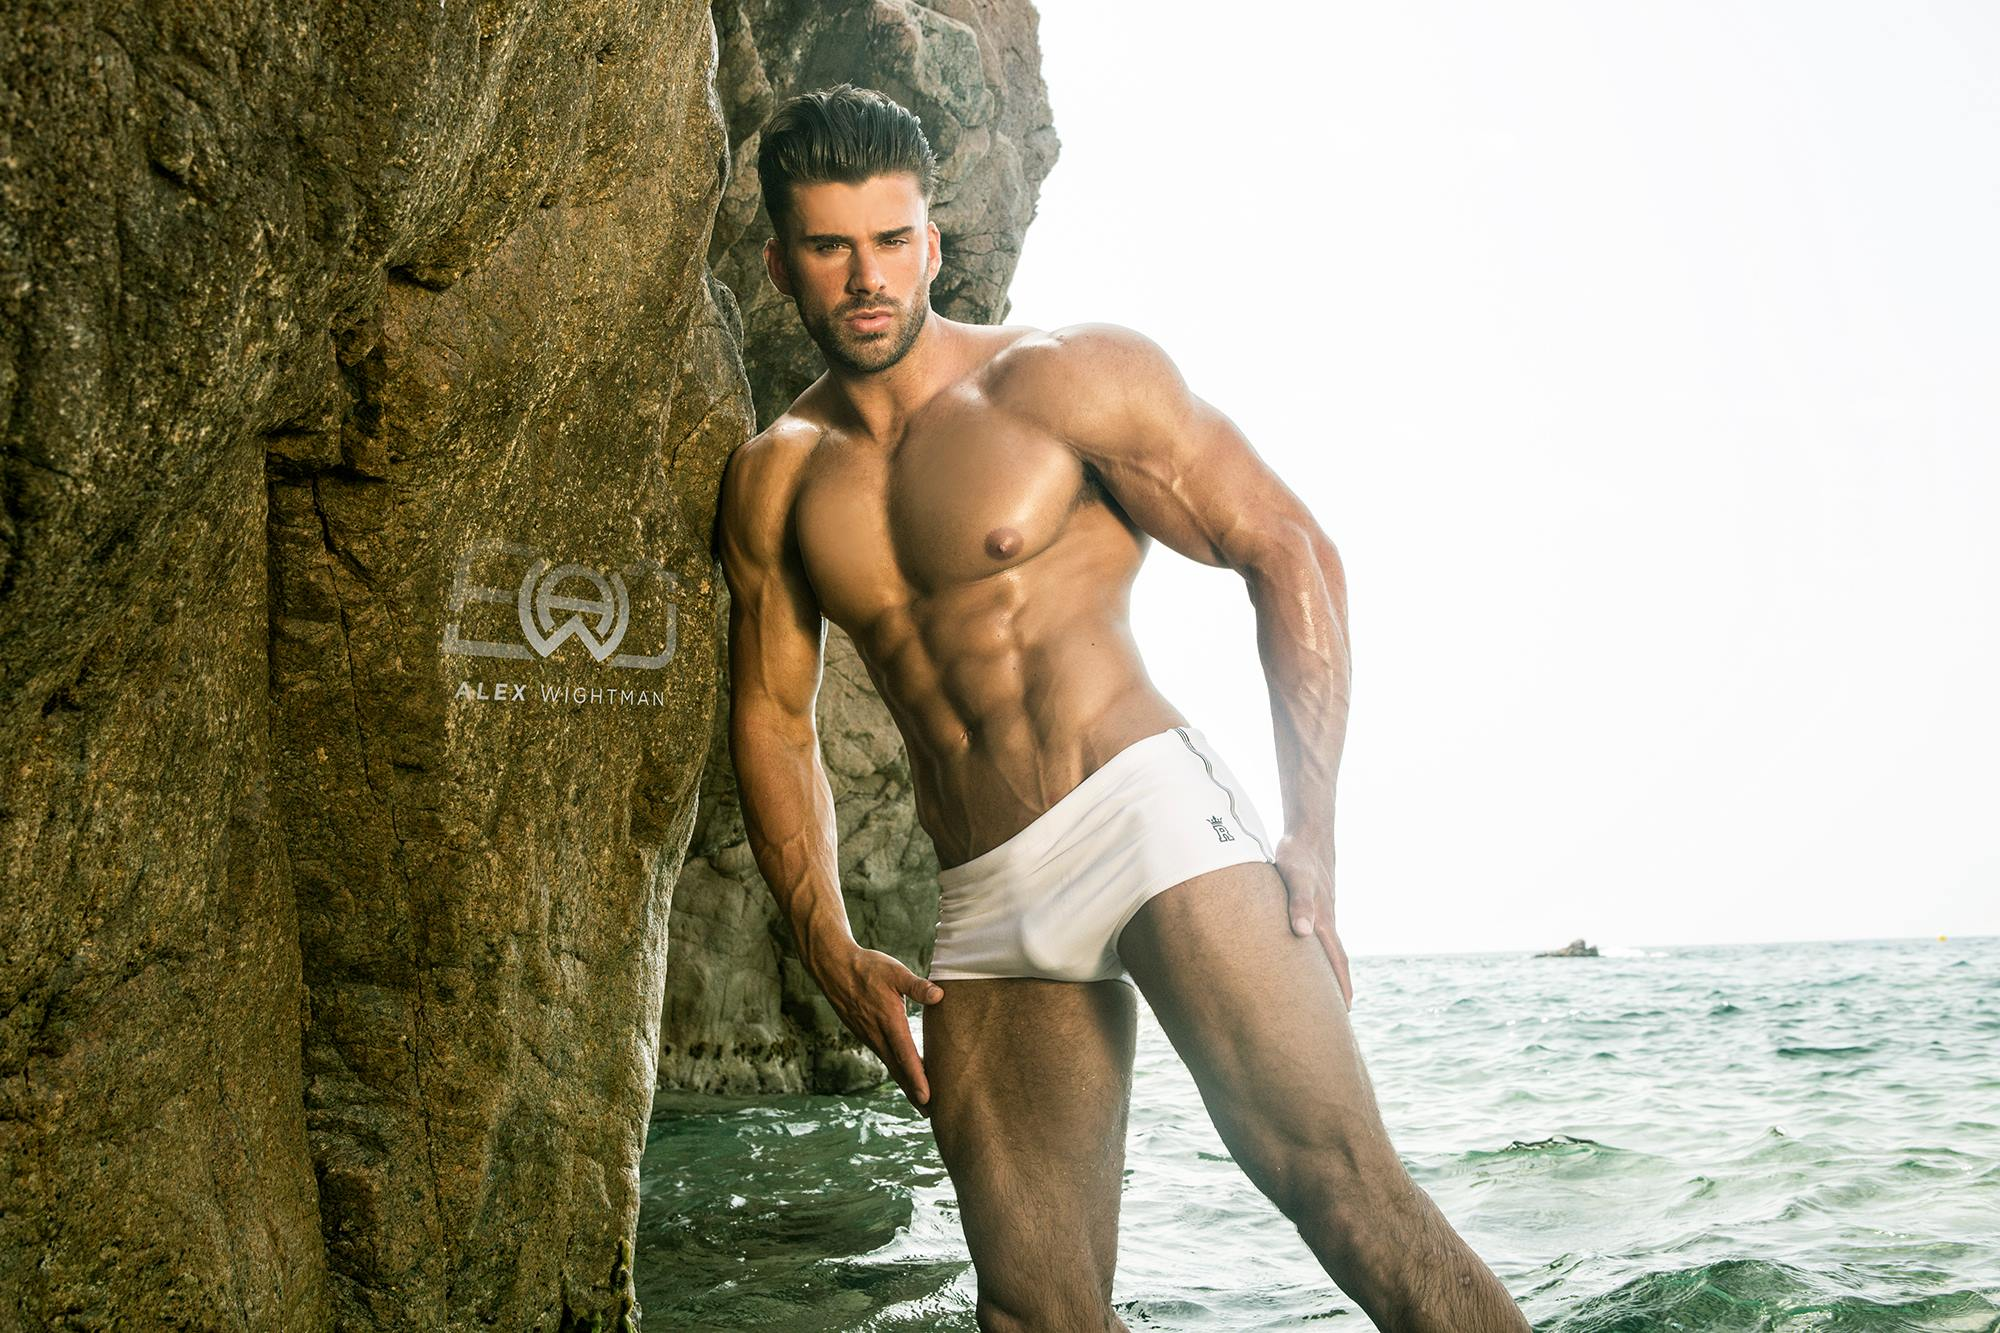 Liam Jolley by Alex Wightman